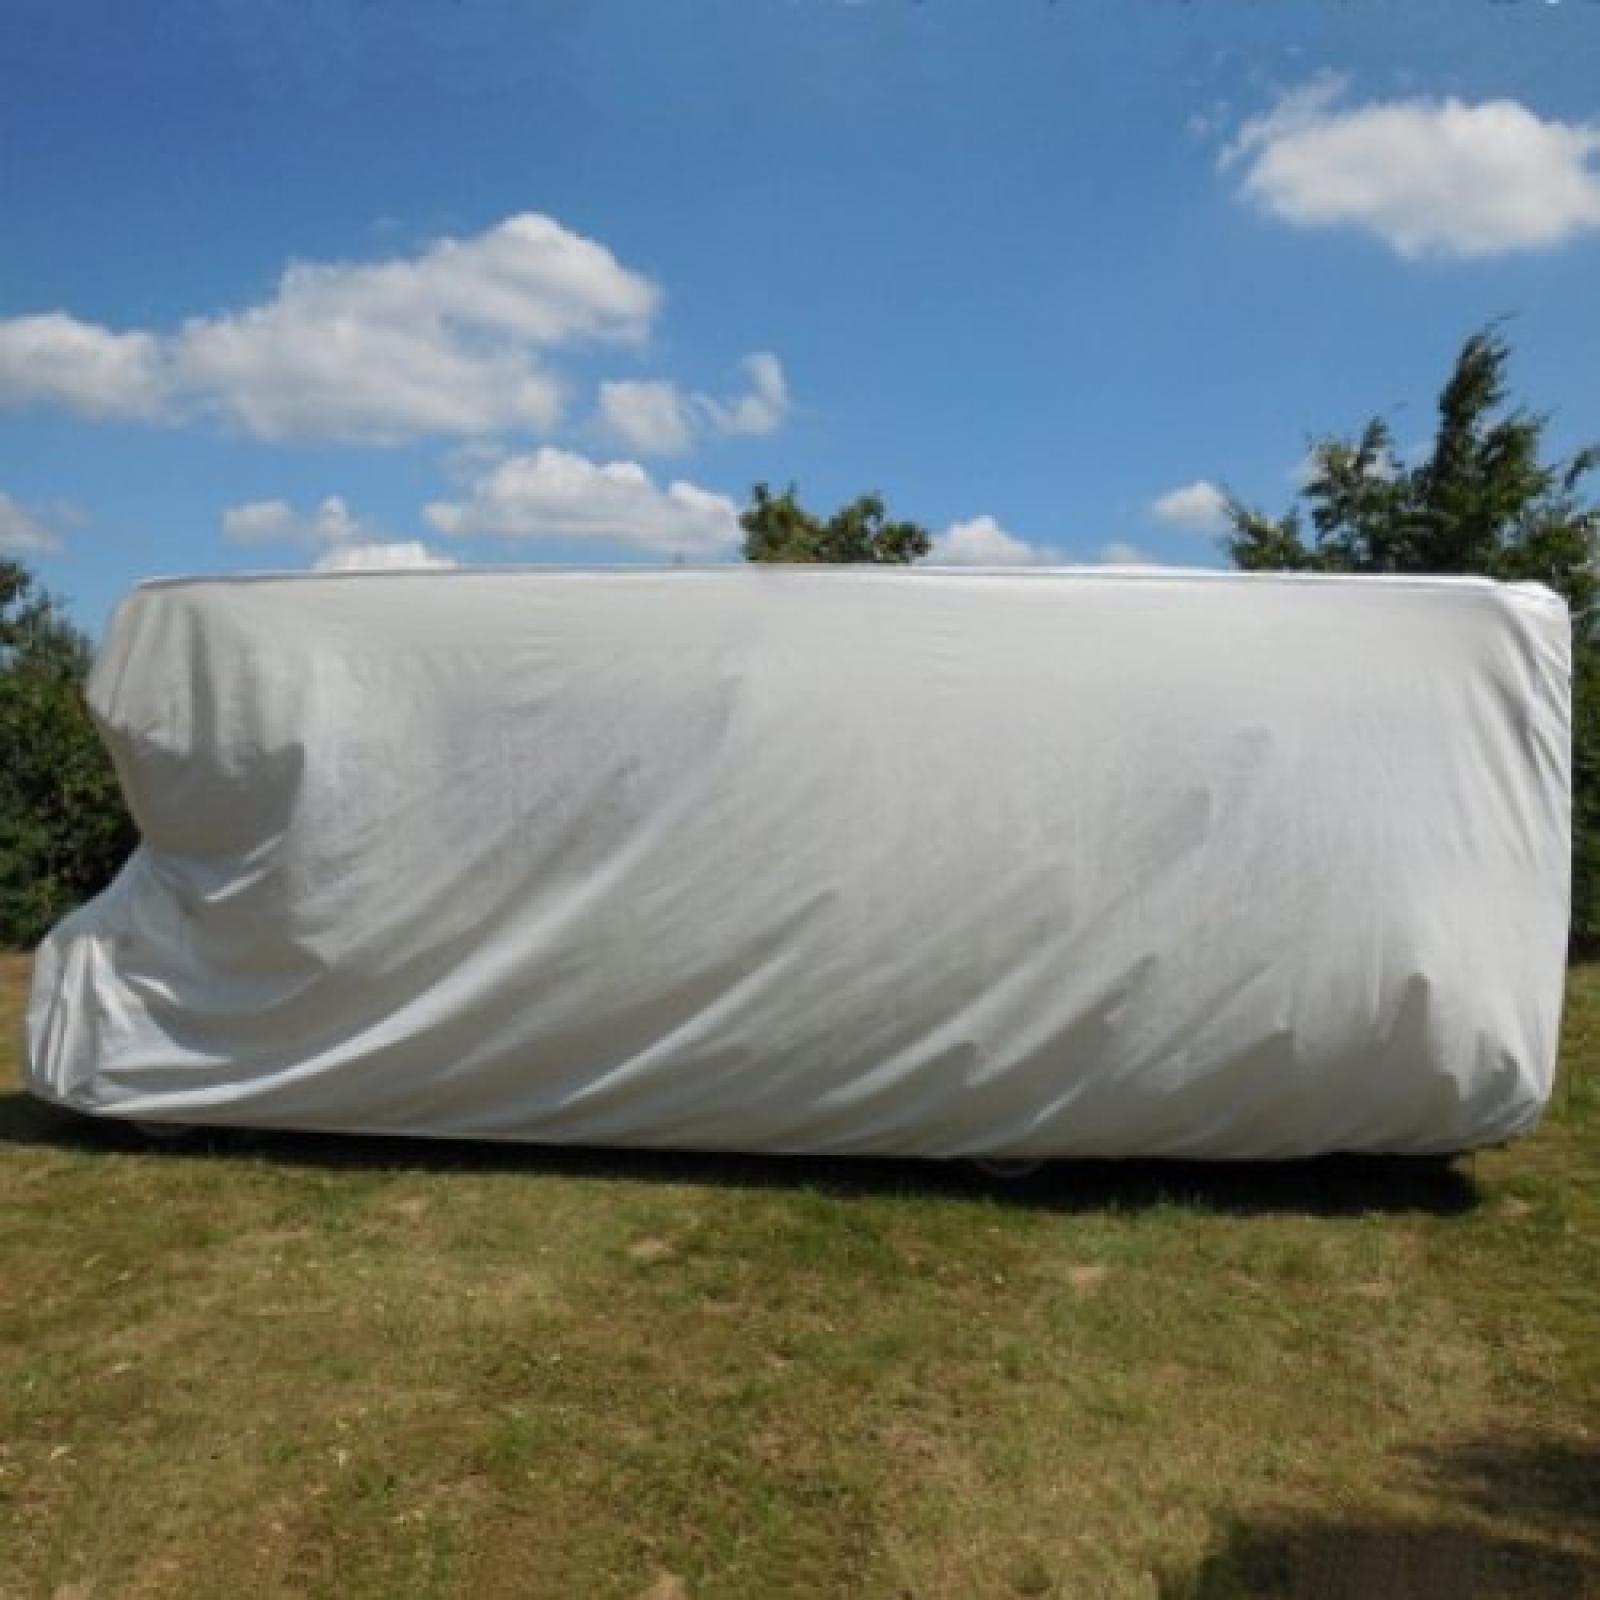 Ixkes Industrieverpackung Faltgar® faltgarage Reisemobil Wohnmobil Wohnwagen 640cm